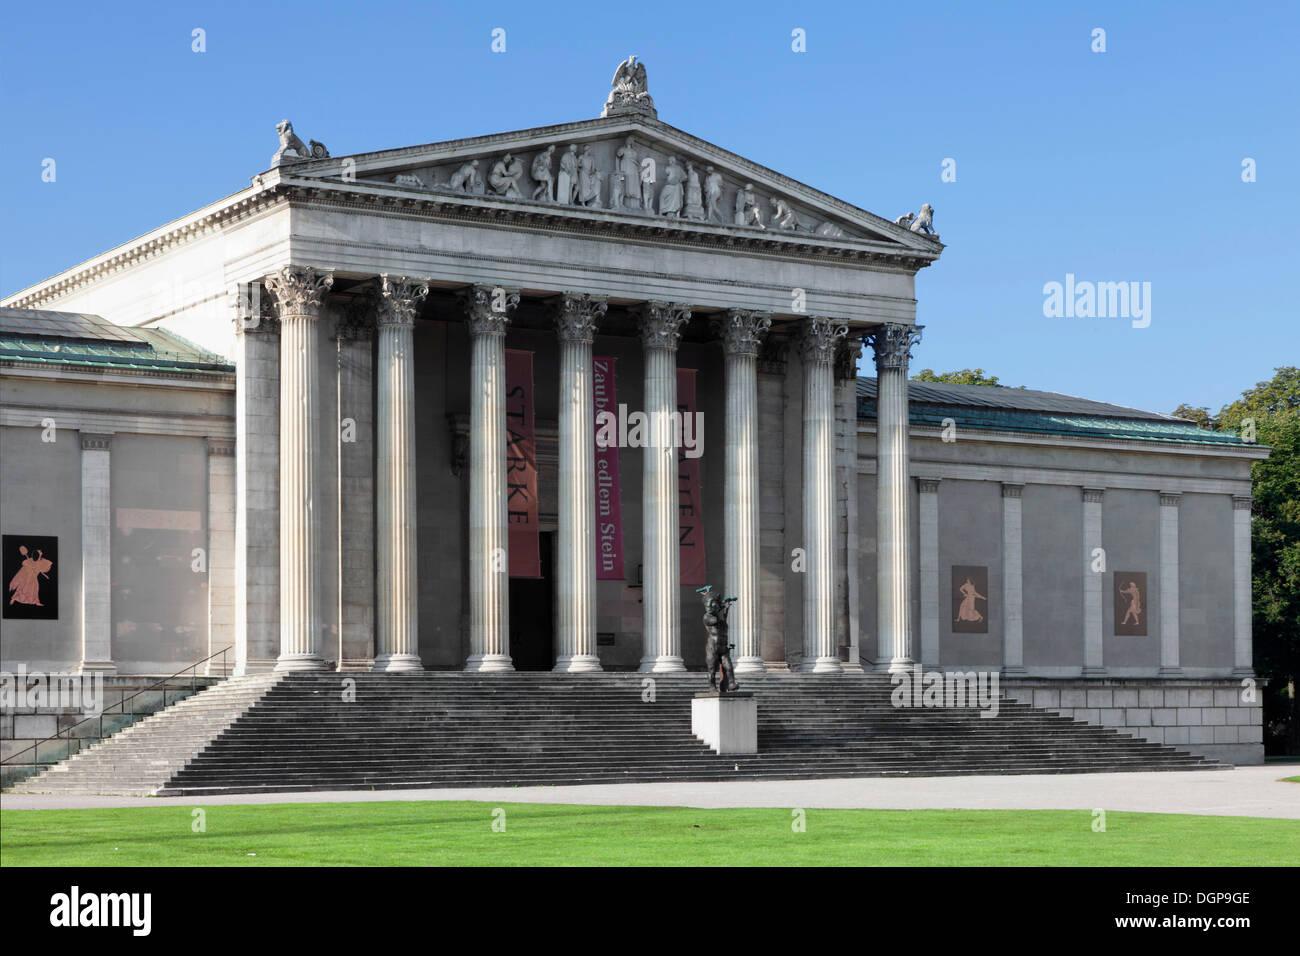 State Collection of Antiquities on Koenigsplatz square, Munich, Upper Bavaria, Bavaria - Stock Image